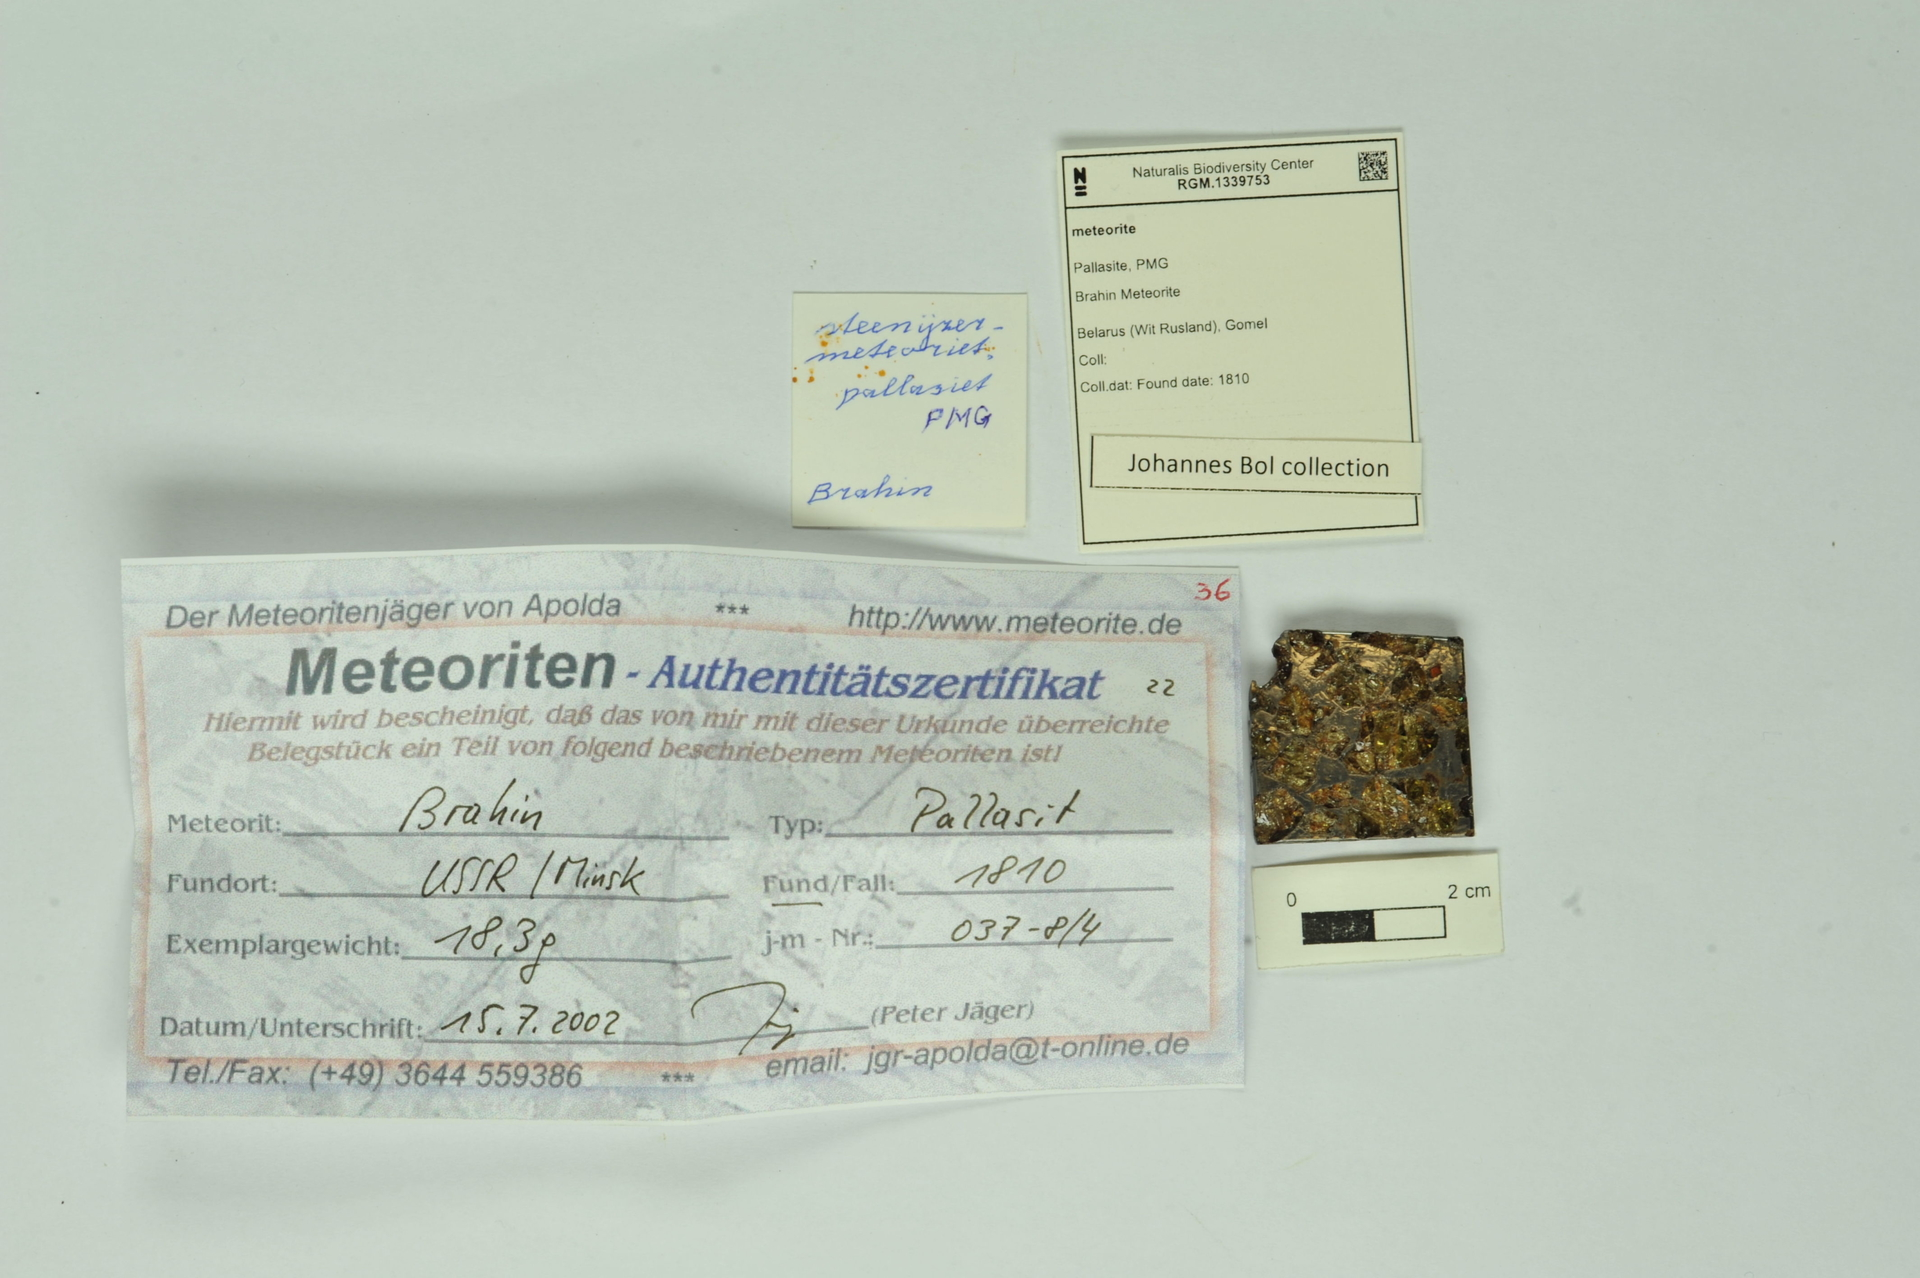 RGM.1339753   Pallasite, PMG